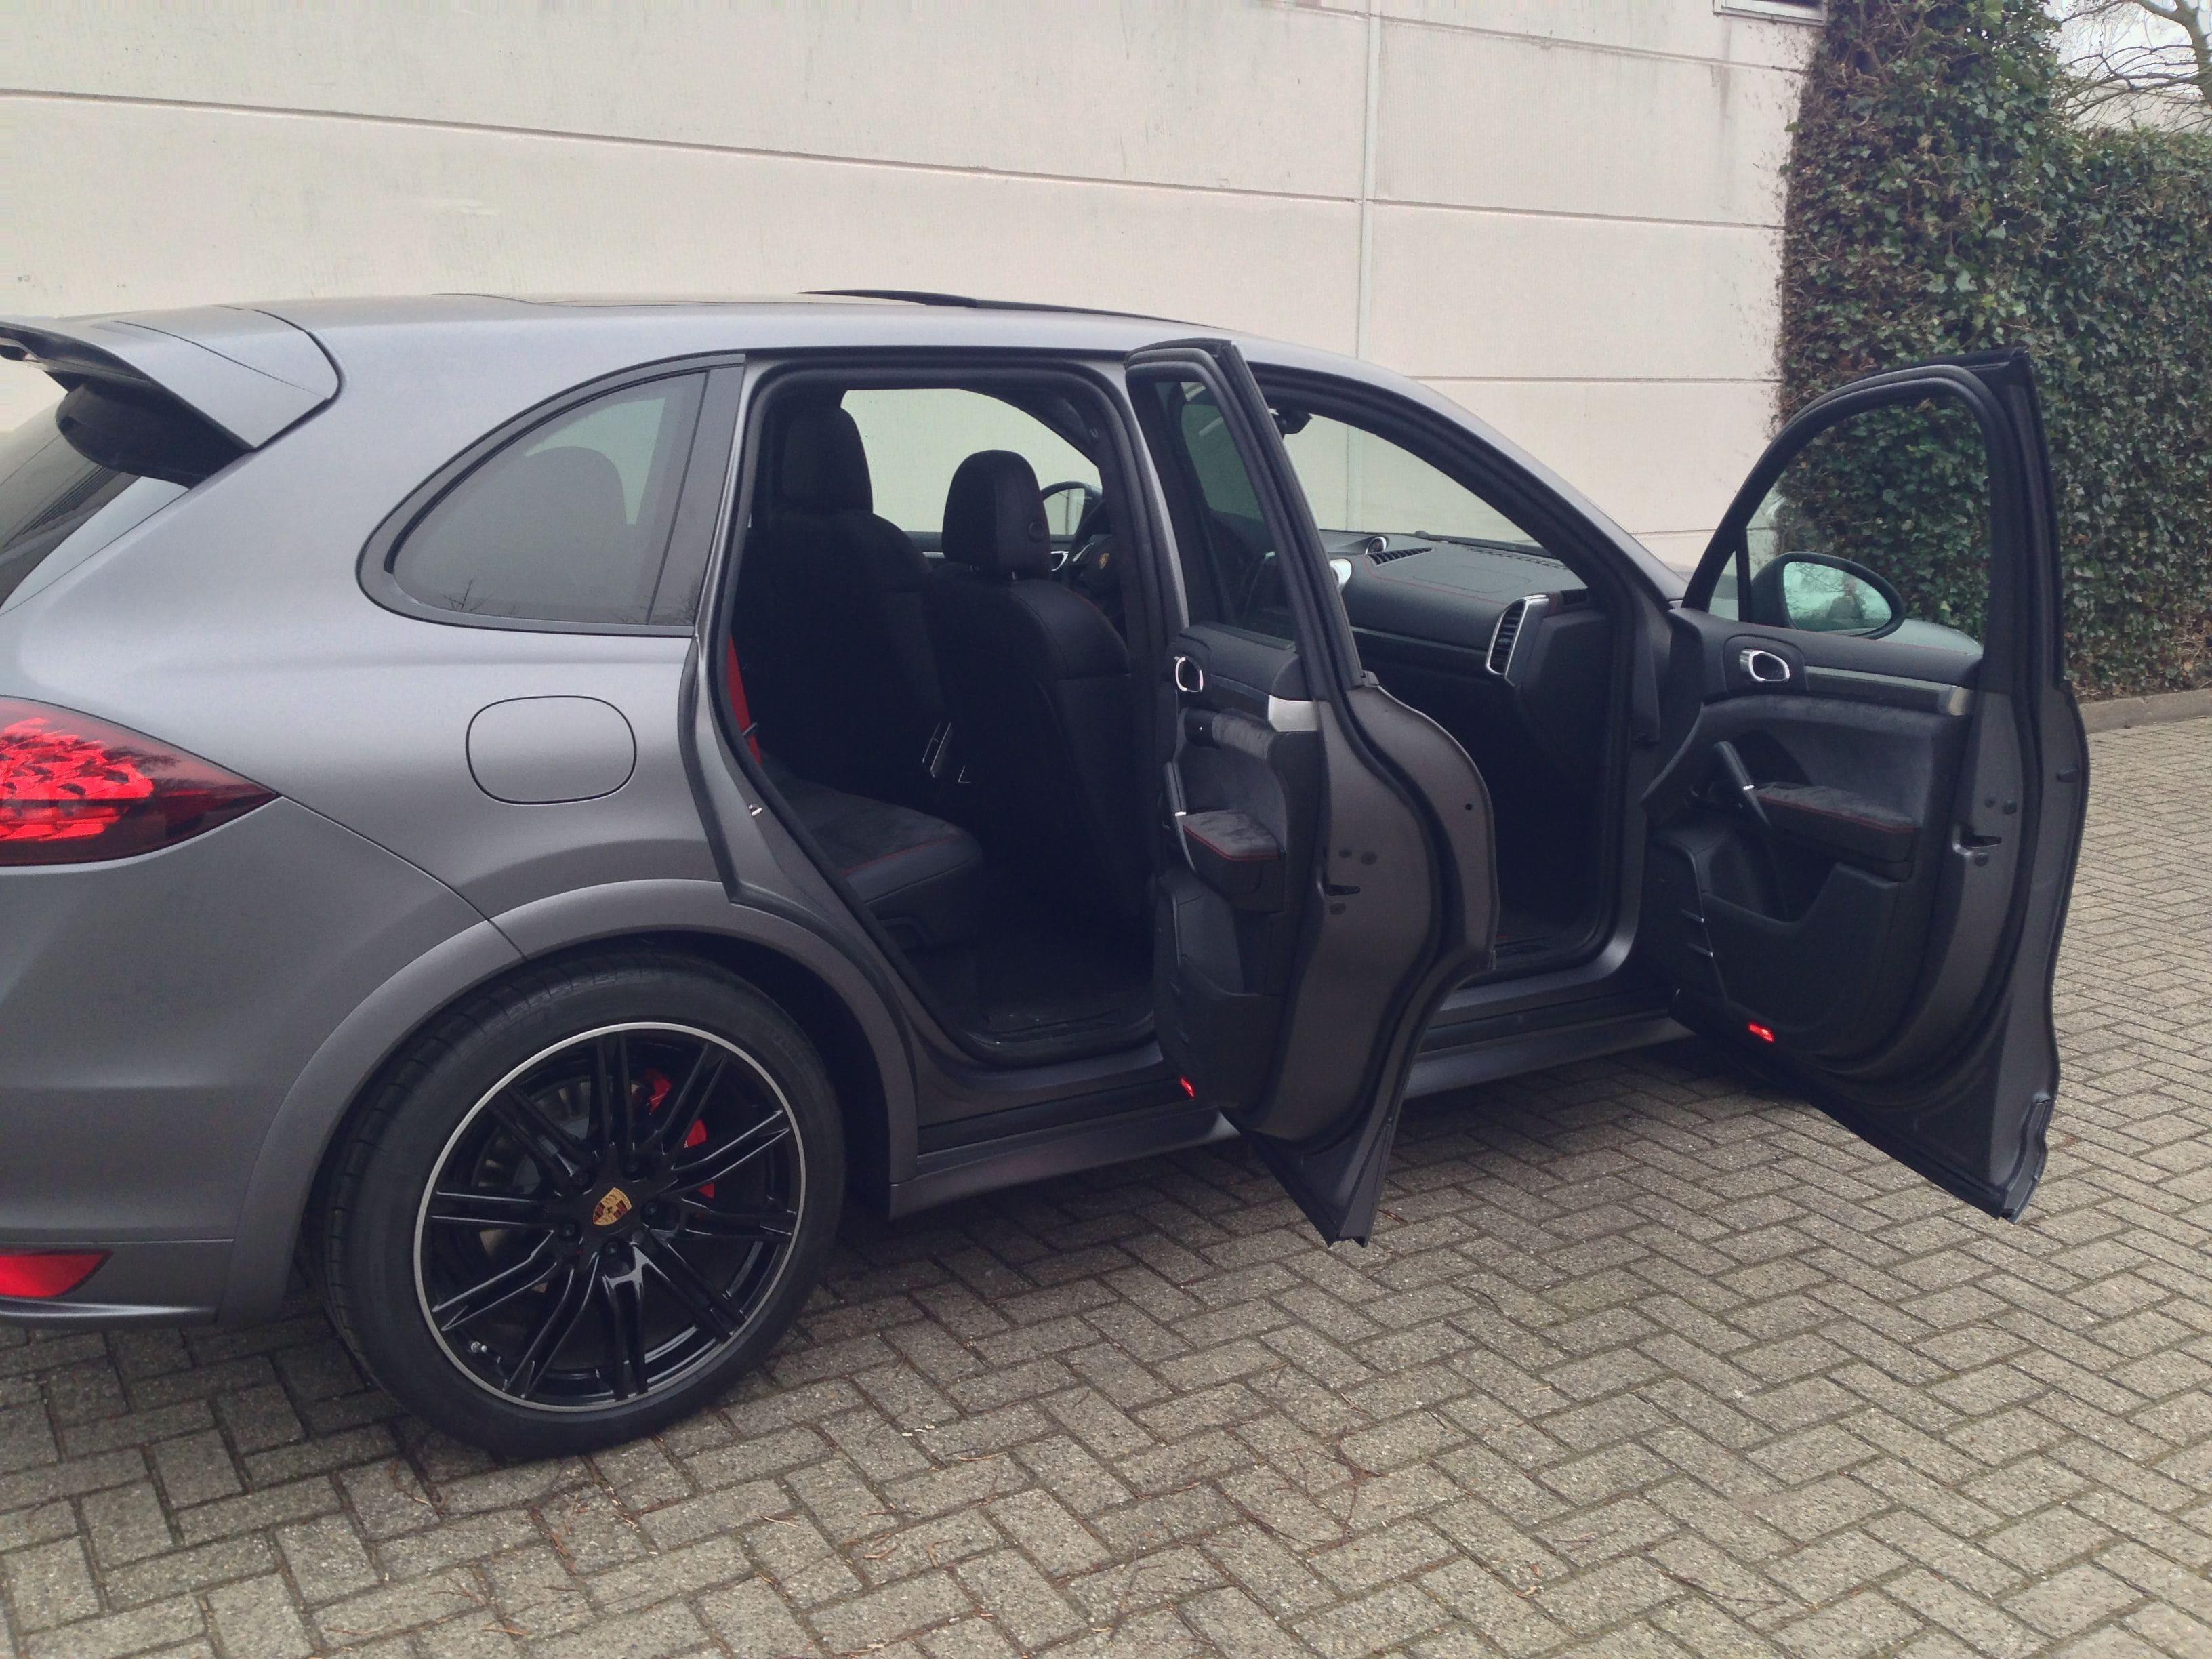 Porsche Cayenne GTS met Gunpowder Wrap, Carwrapping door Wrapmyride.nu Foto-nr:6792, ©2021